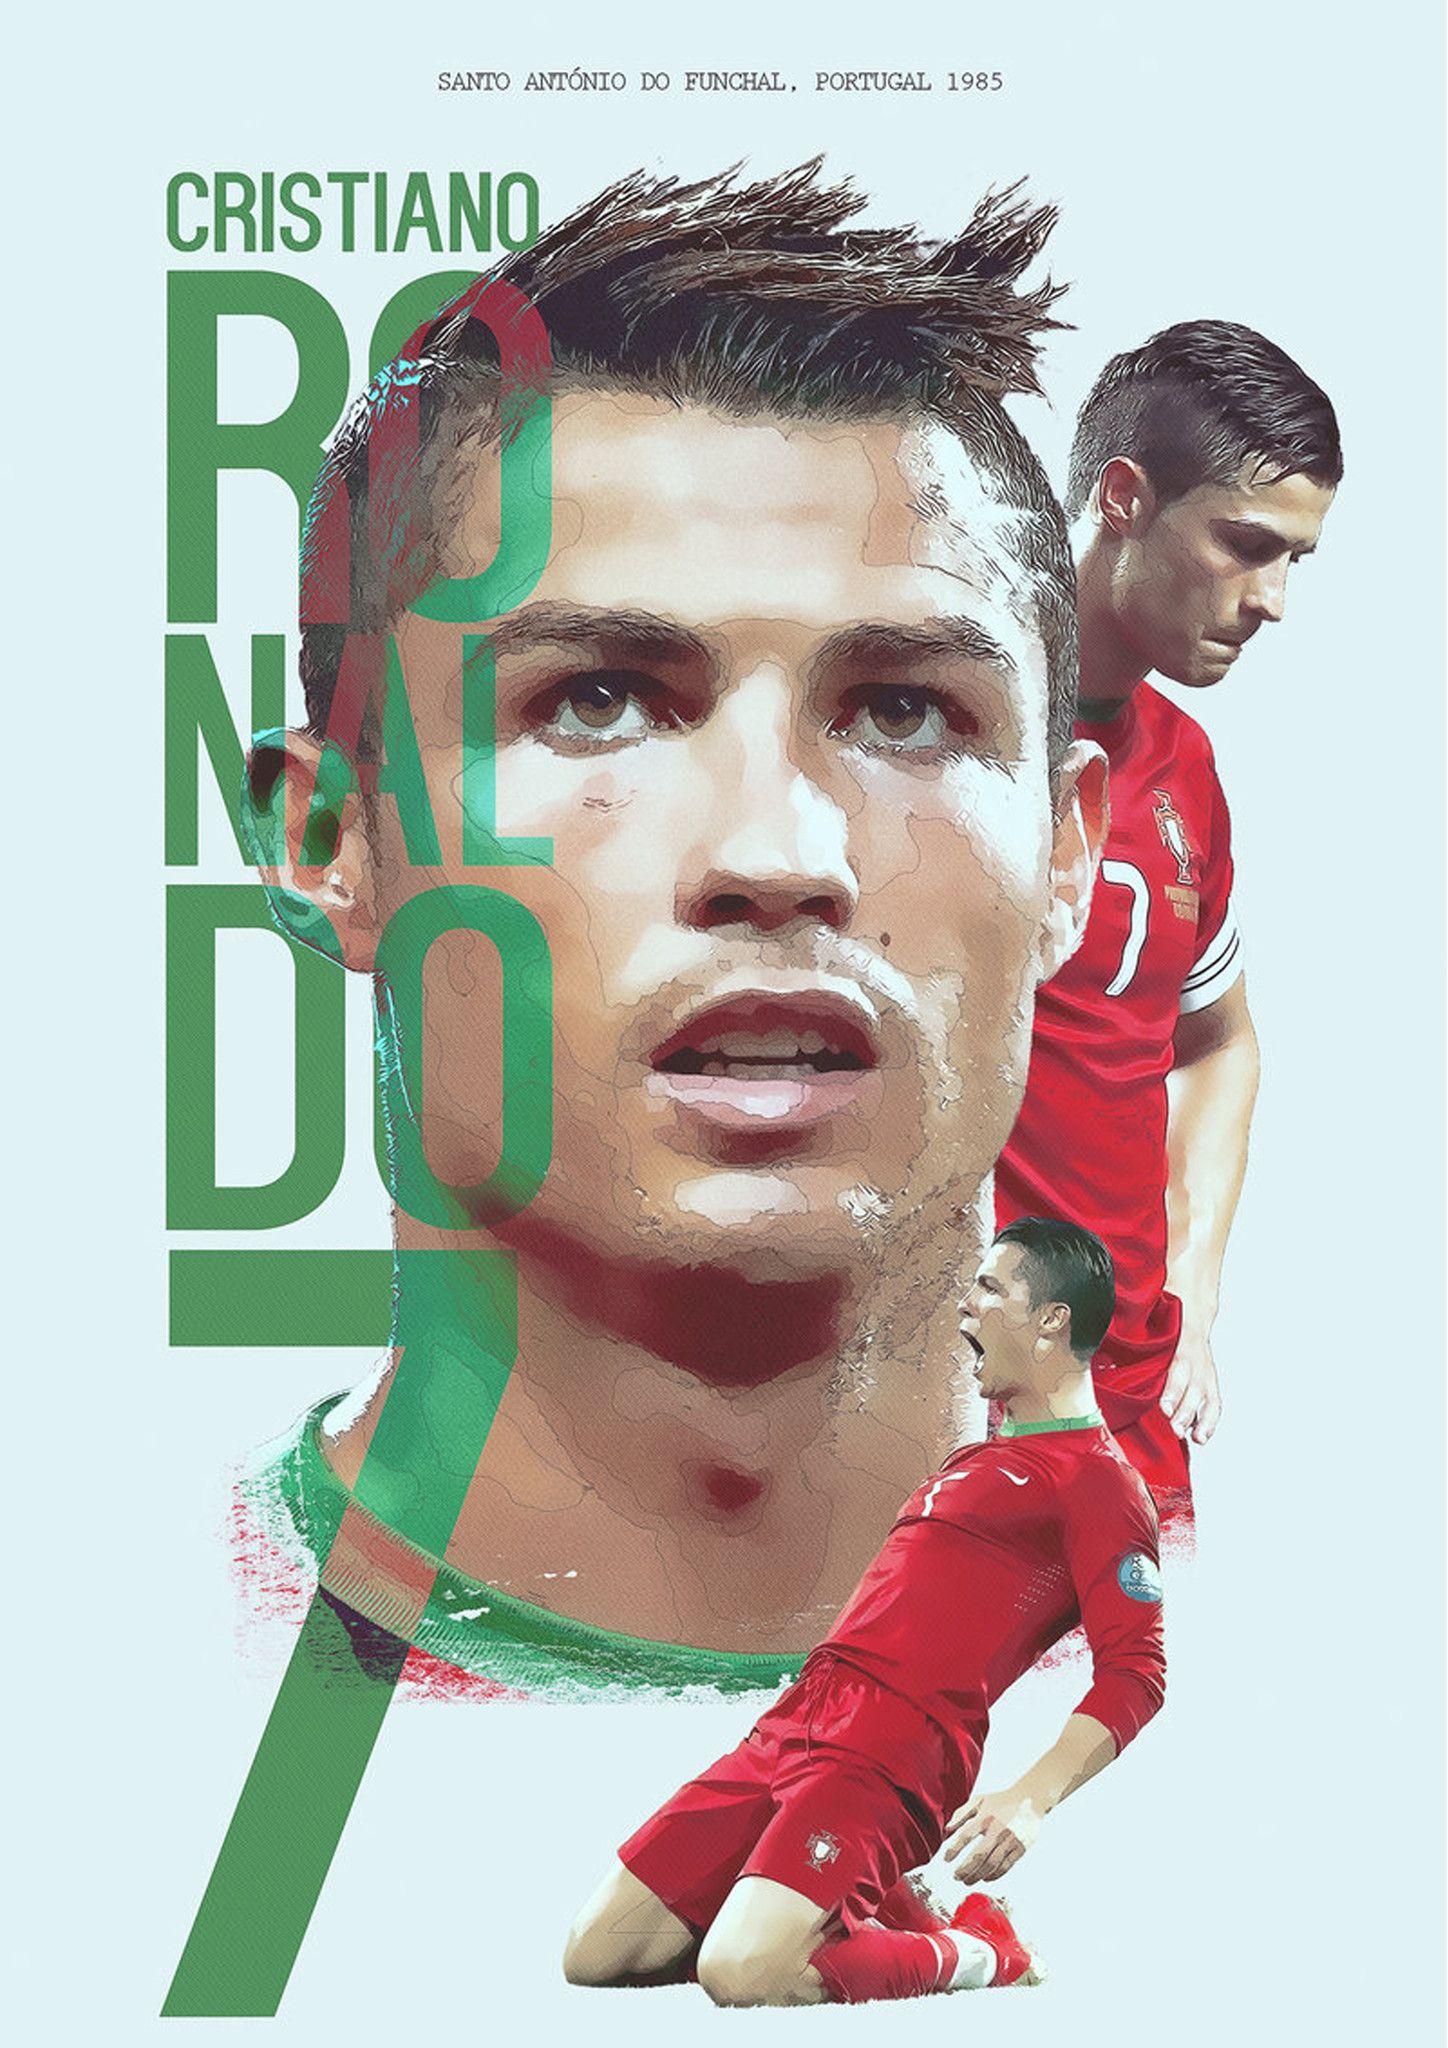 Cristiano Ronaldo 7 Motivation Portuguese Professional Footballer Poster Photo